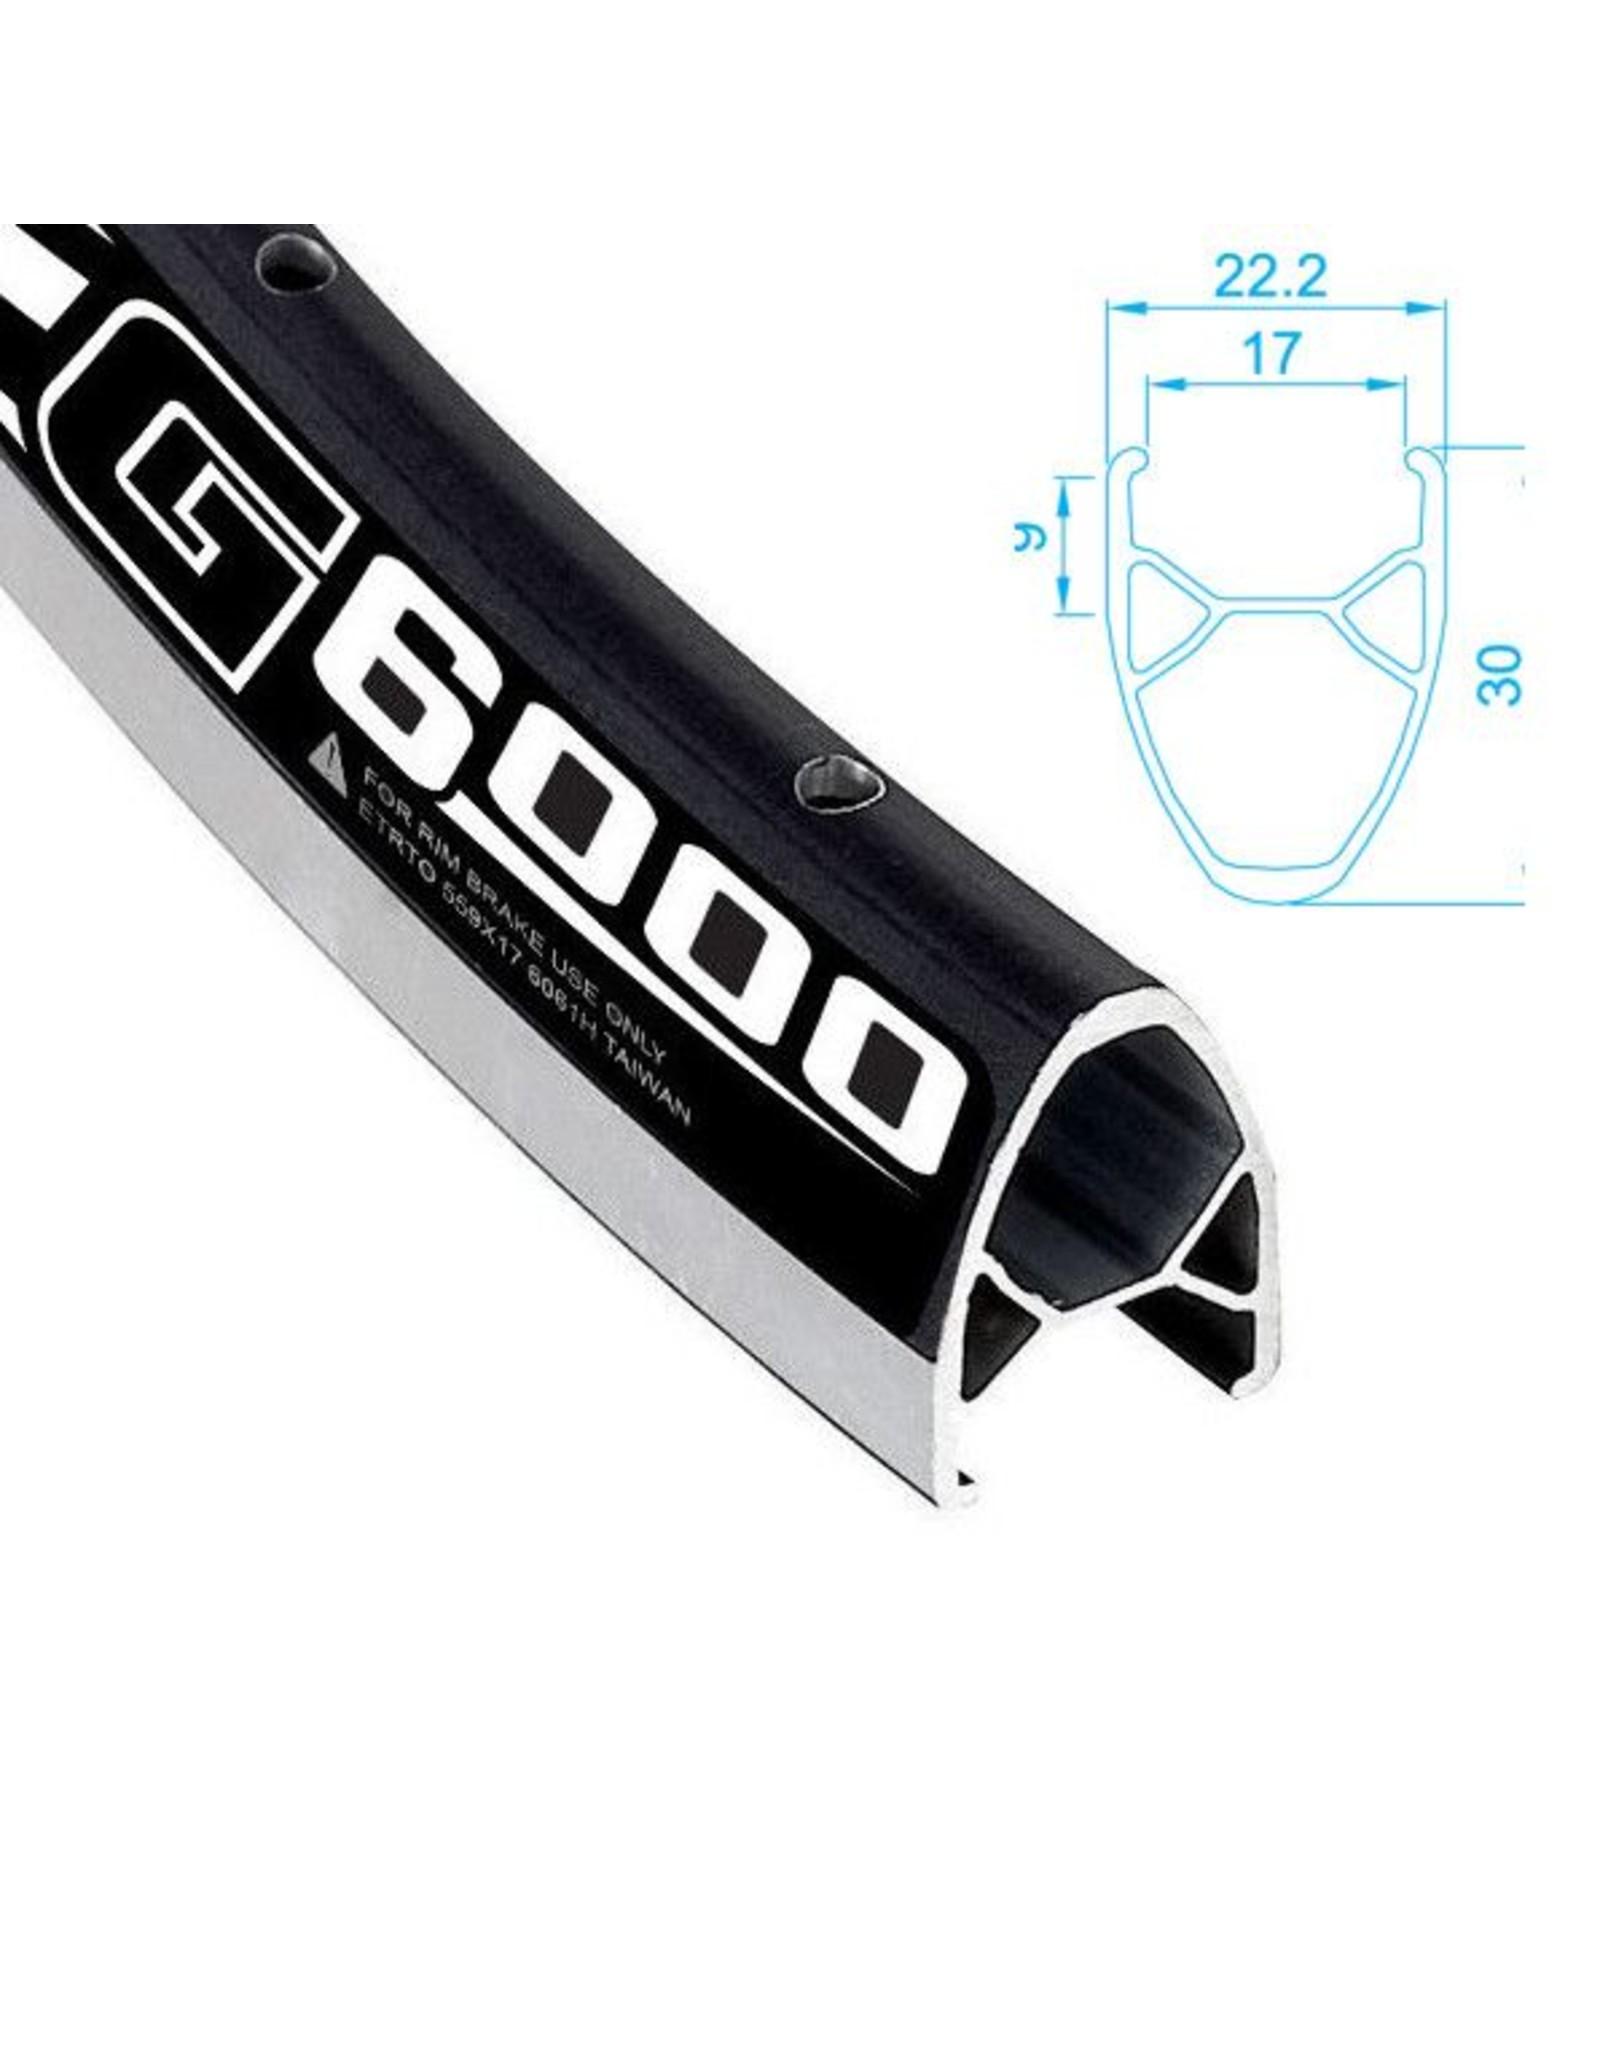 ALEXRIMS 700 G6000 FW Hybrid Rear Wheel Black